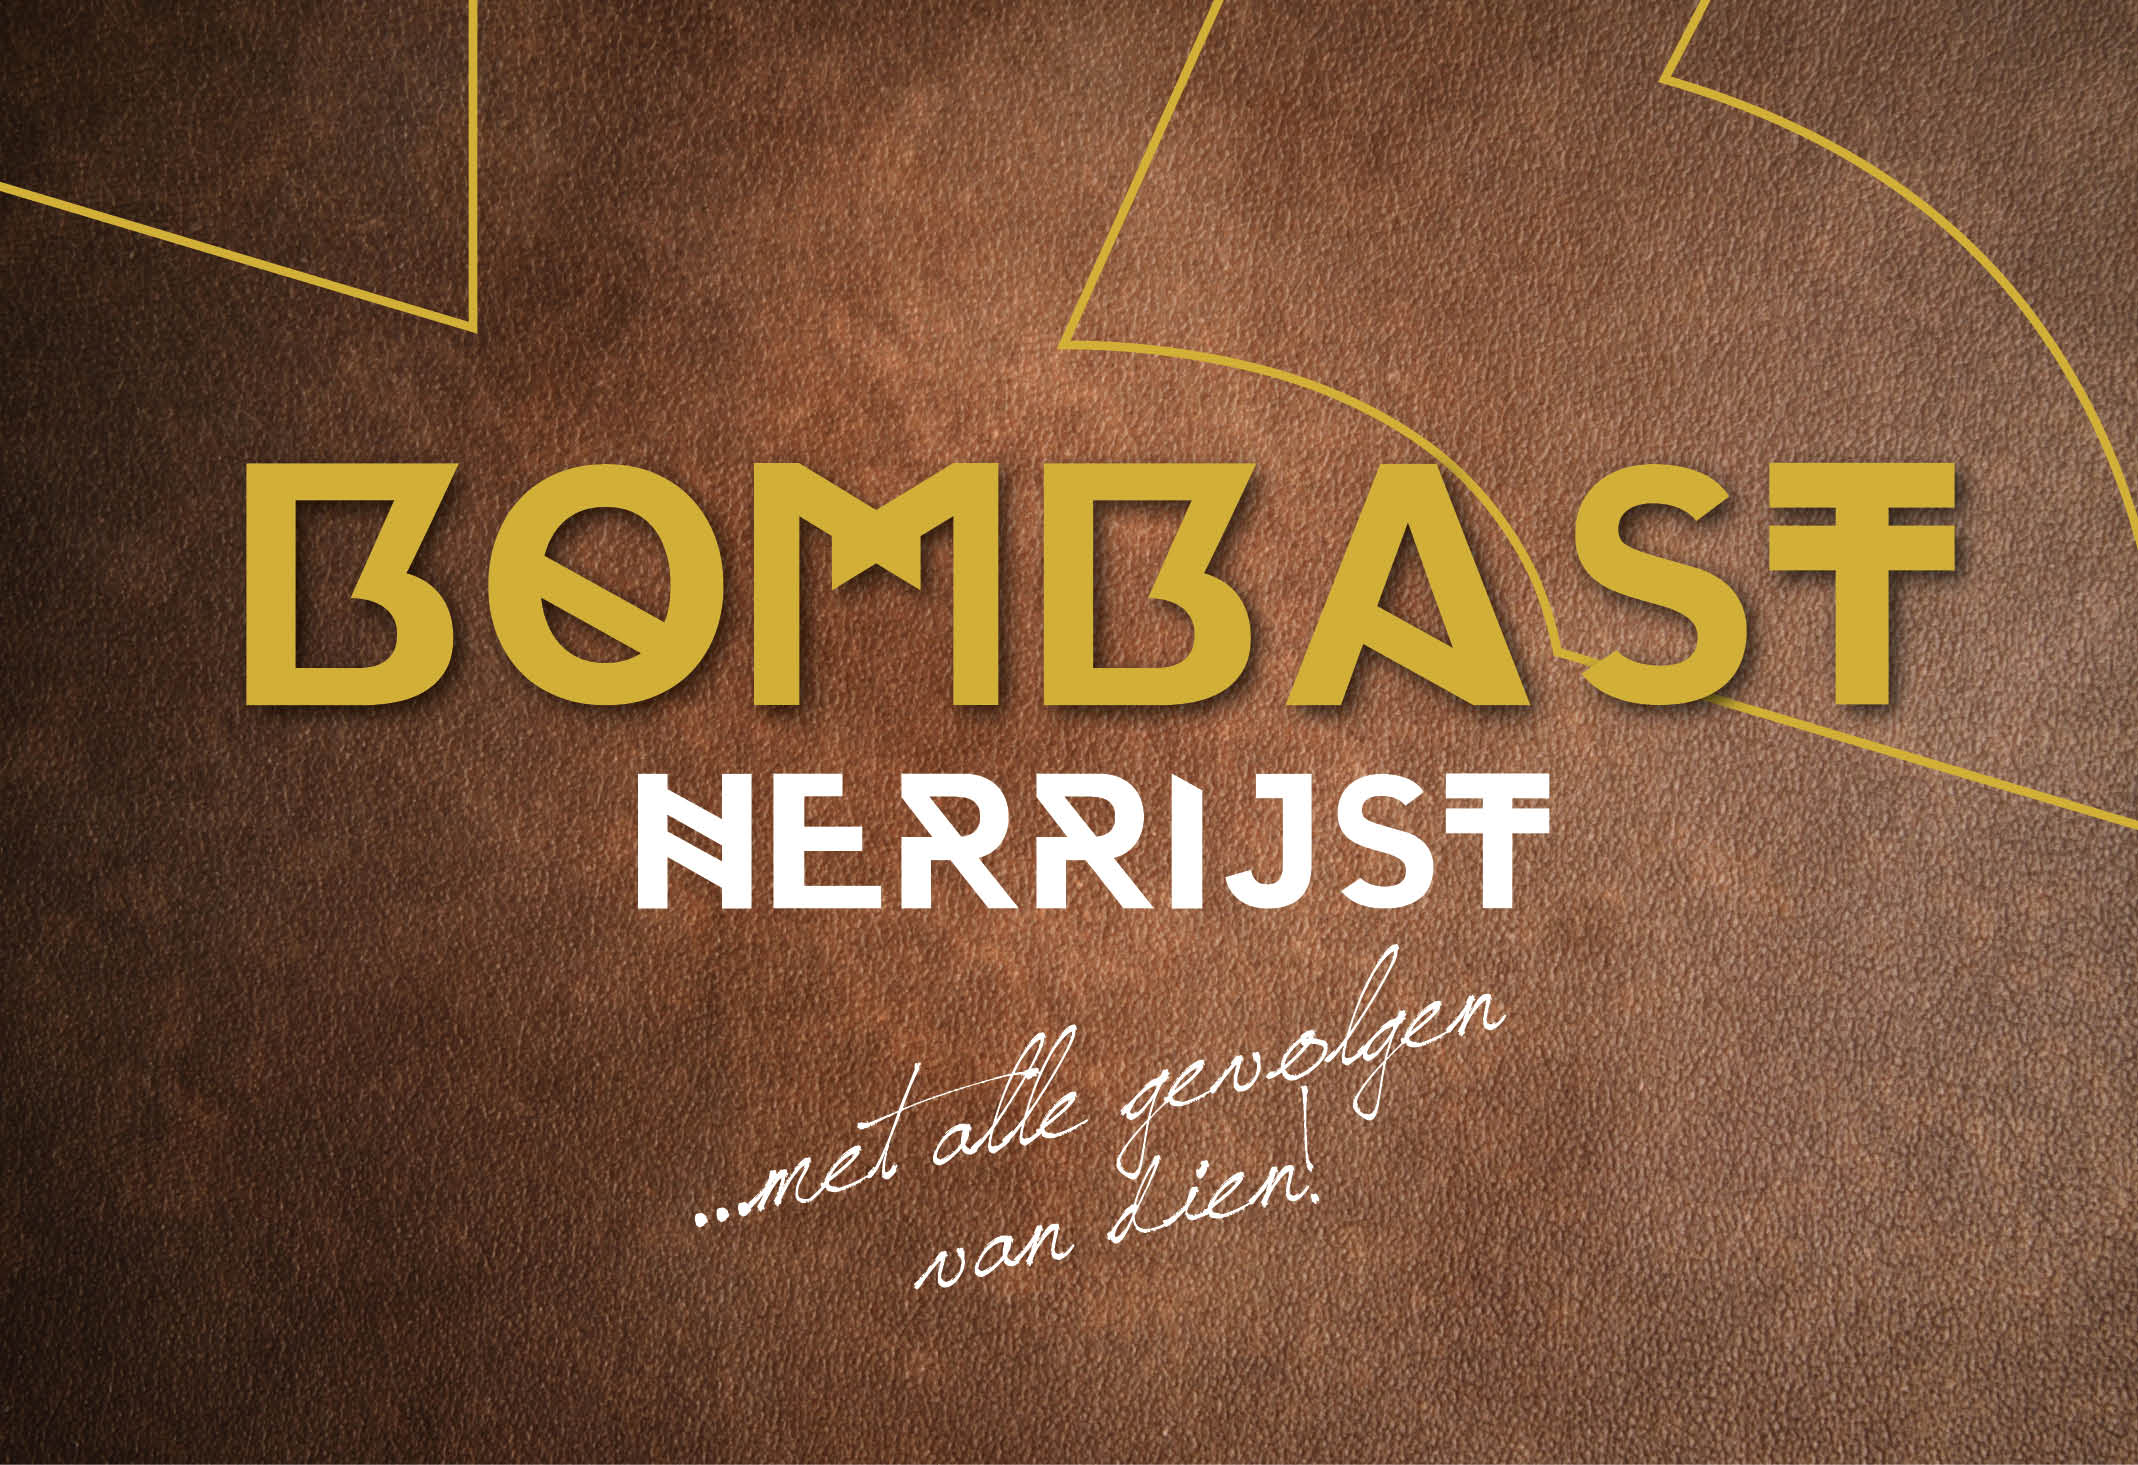 [VIDEO] Bombast Herrijst!